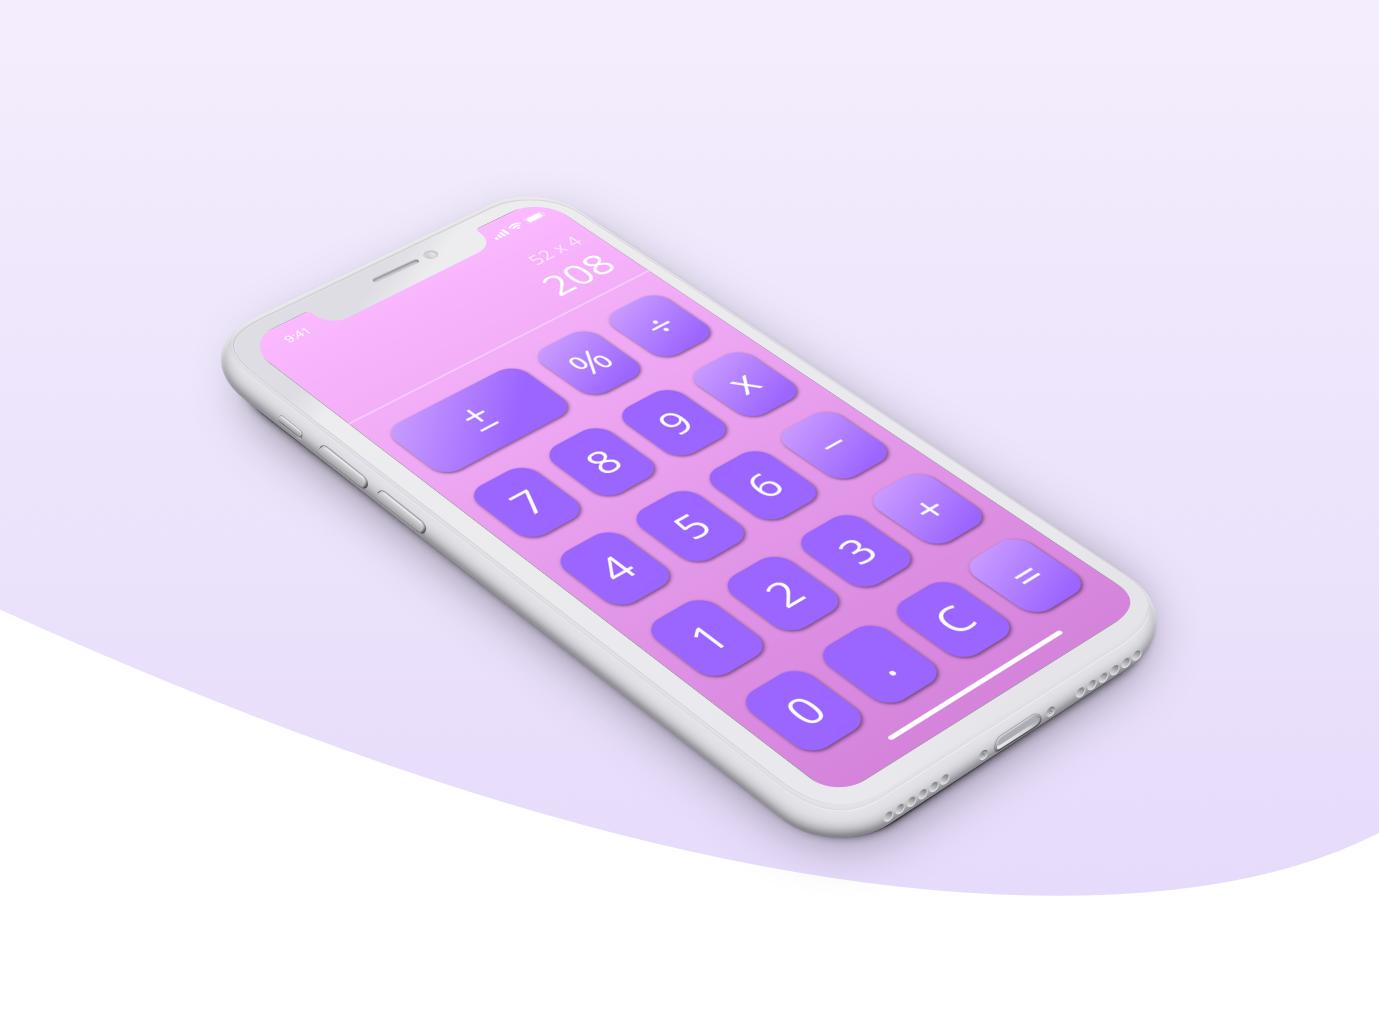 Calculator Mockup ios mobile calculator design app ux ui